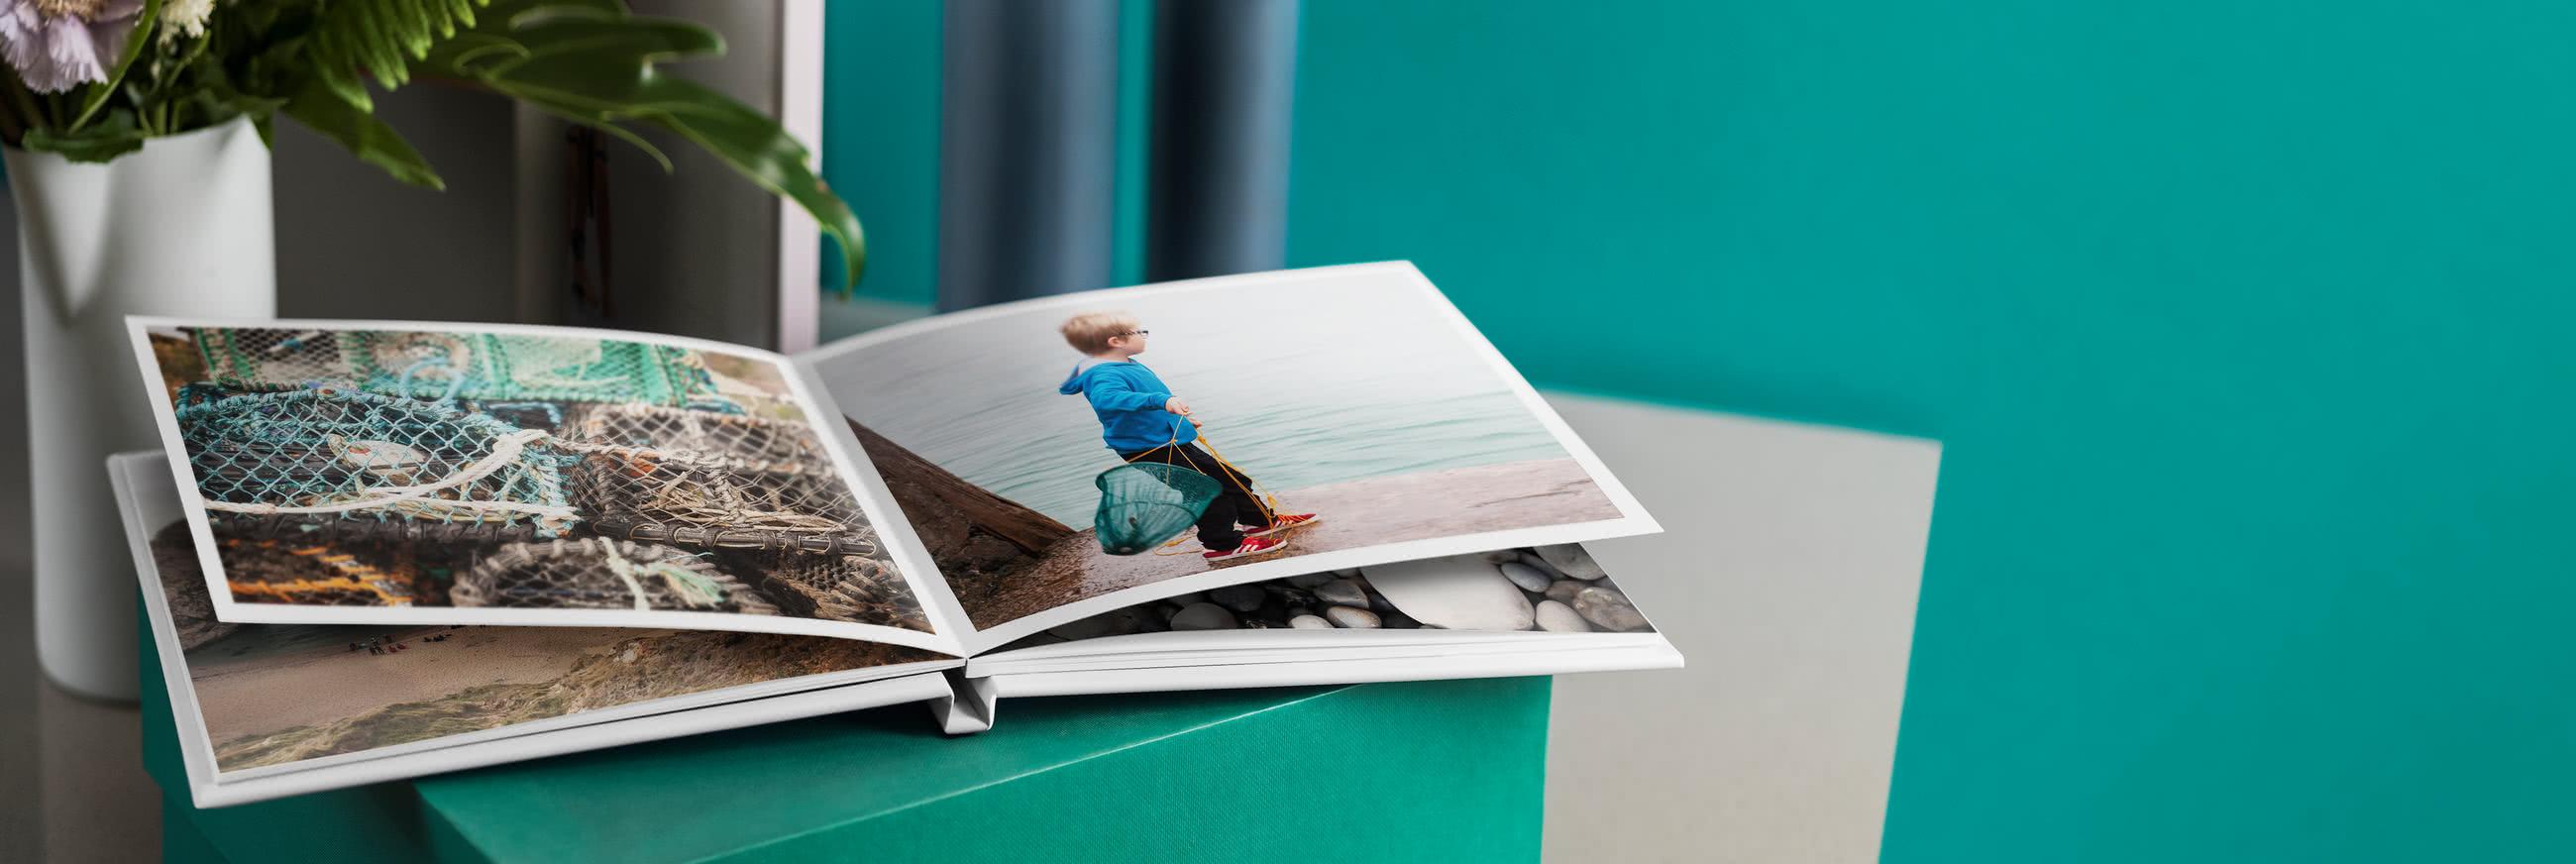 livre photo premium carr photobox. Black Bedroom Furniture Sets. Home Design Ideas